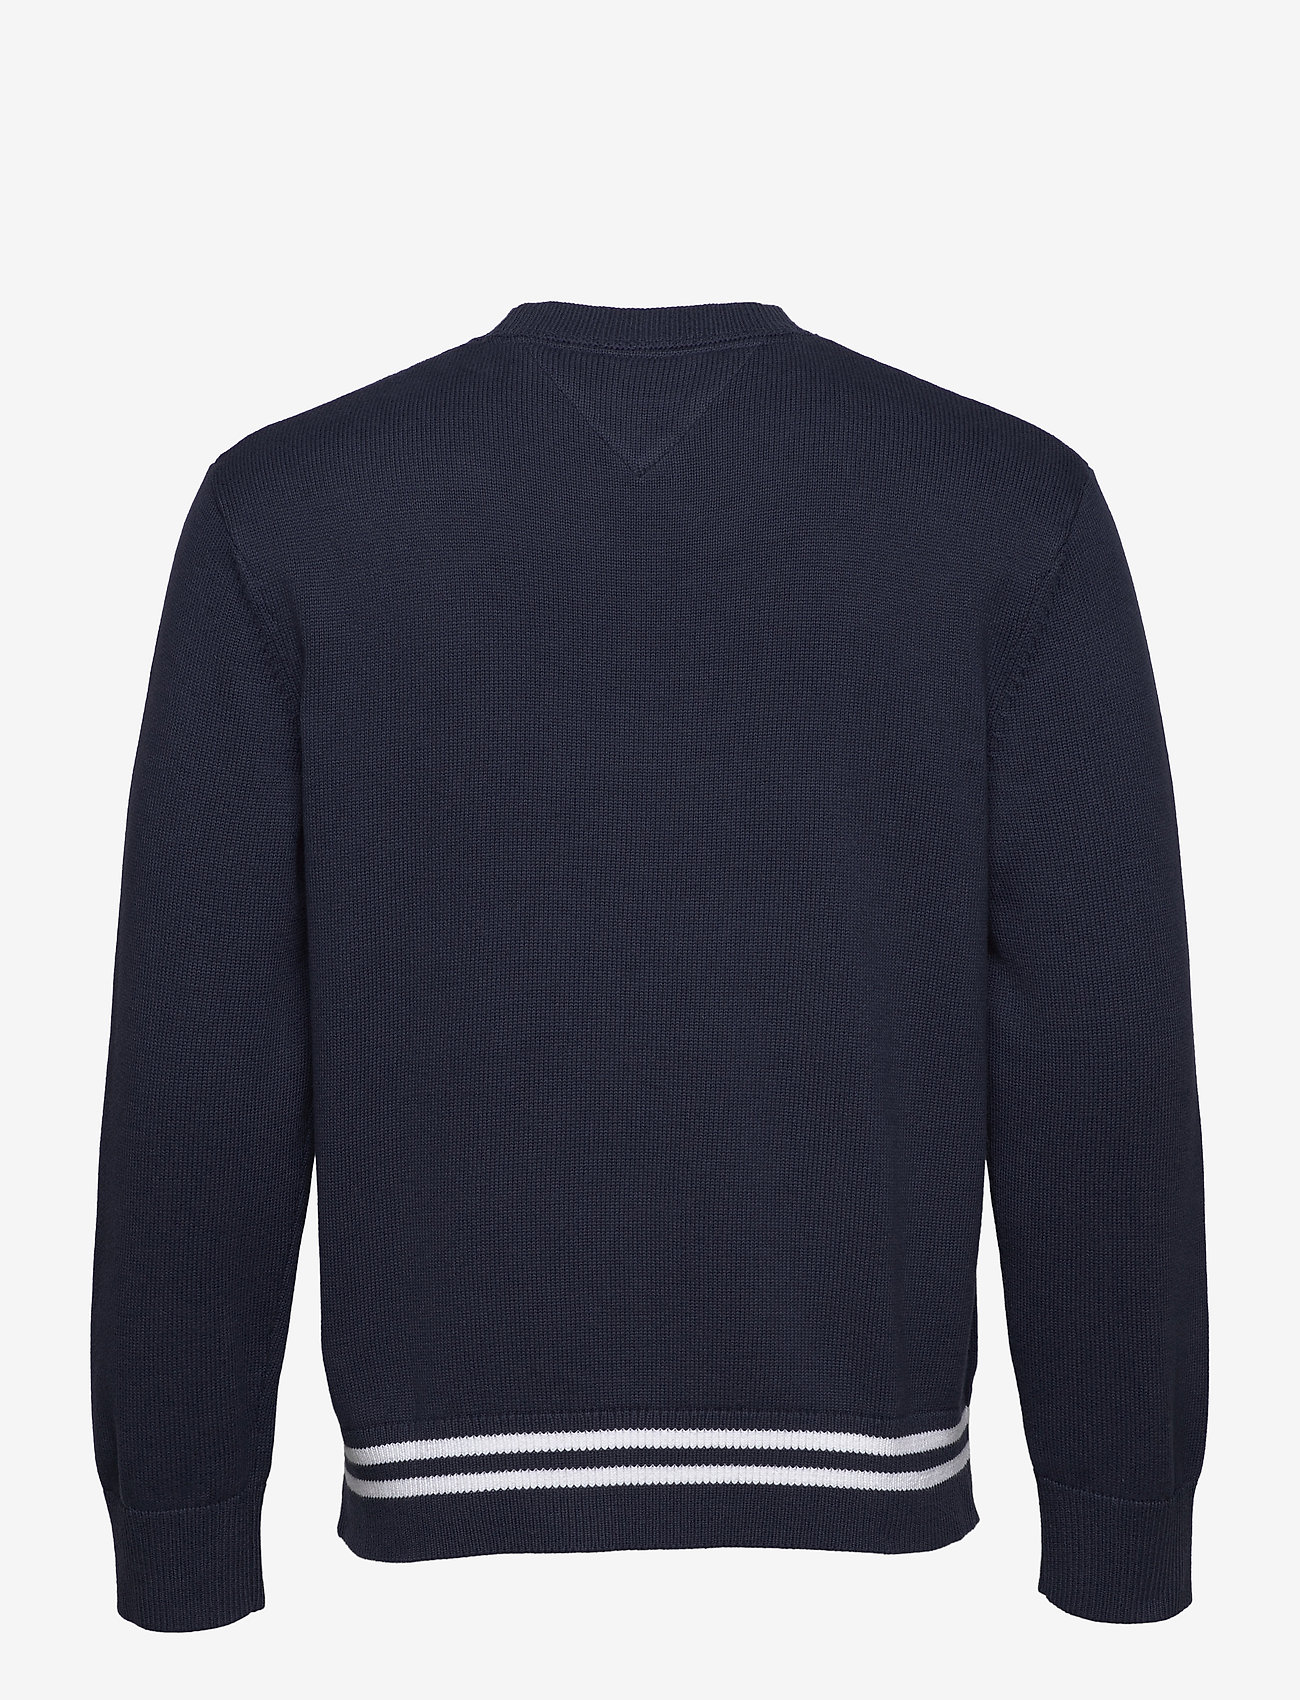 Tommy Jeans - TJM BADGE TEXTURED SWEATER - stickade basplagg - twilight navy / silver grey htr - 1